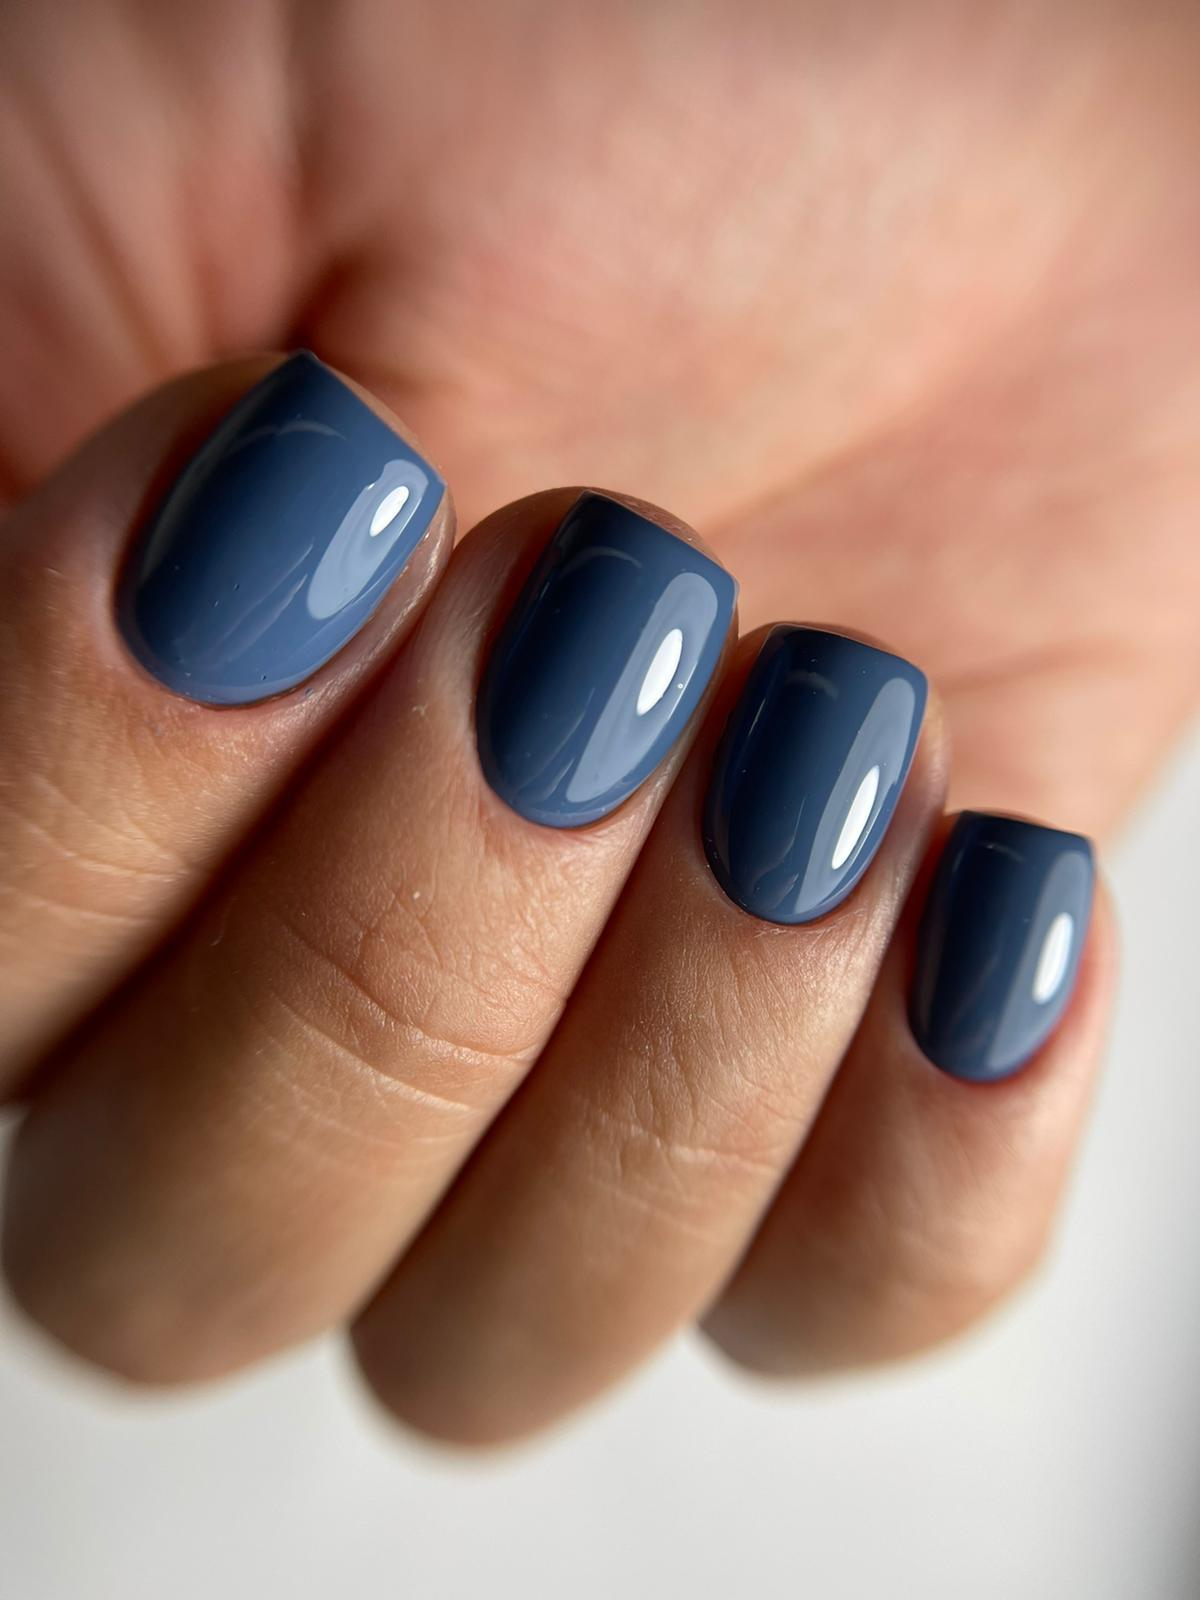 076 כחול ג'ינס - LINUX Professional Gel Polish 15 ML